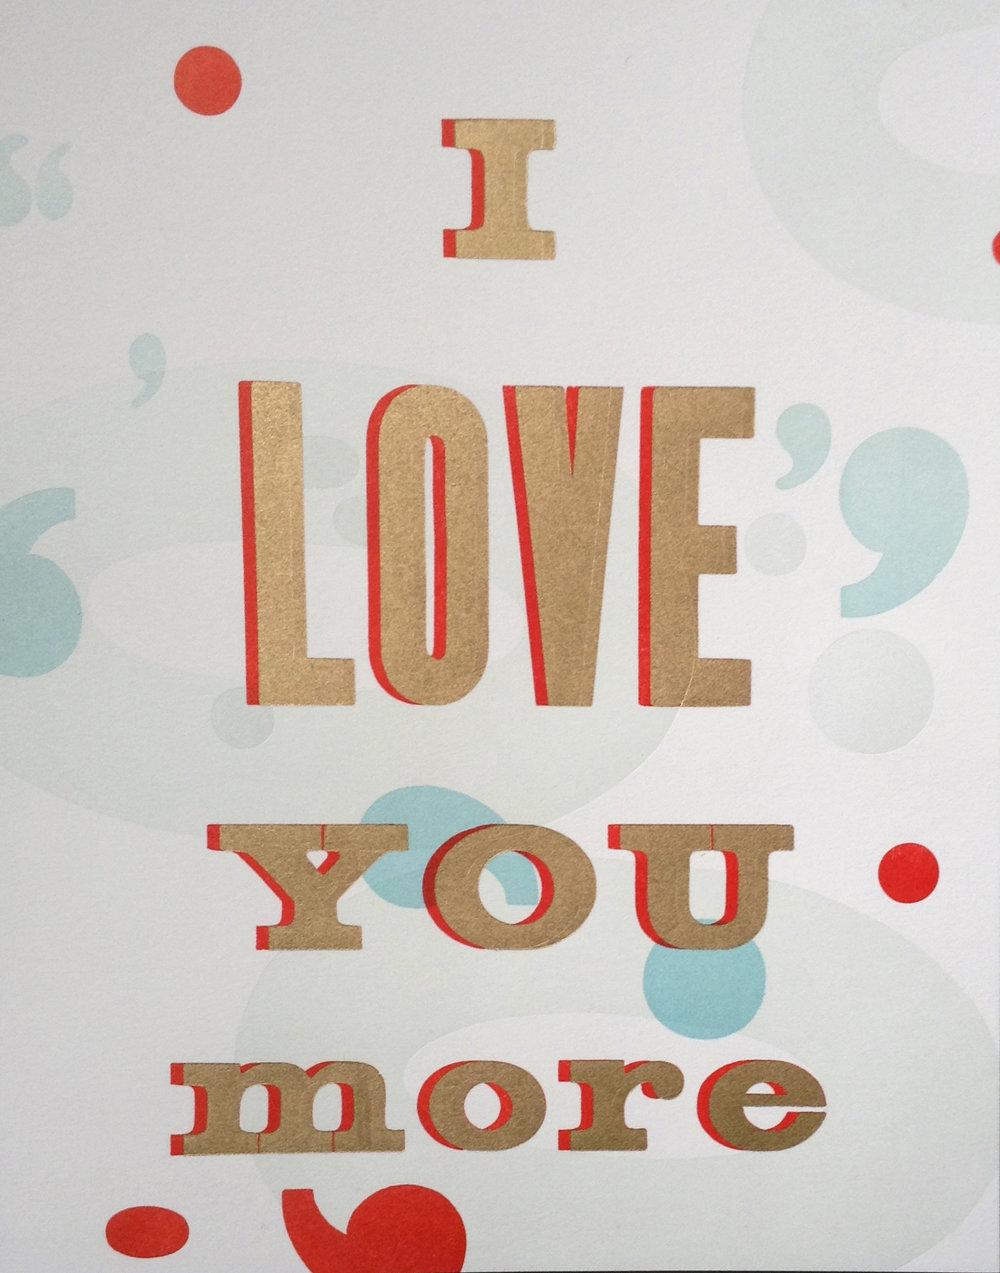 cclifford_I Love You More.jpg